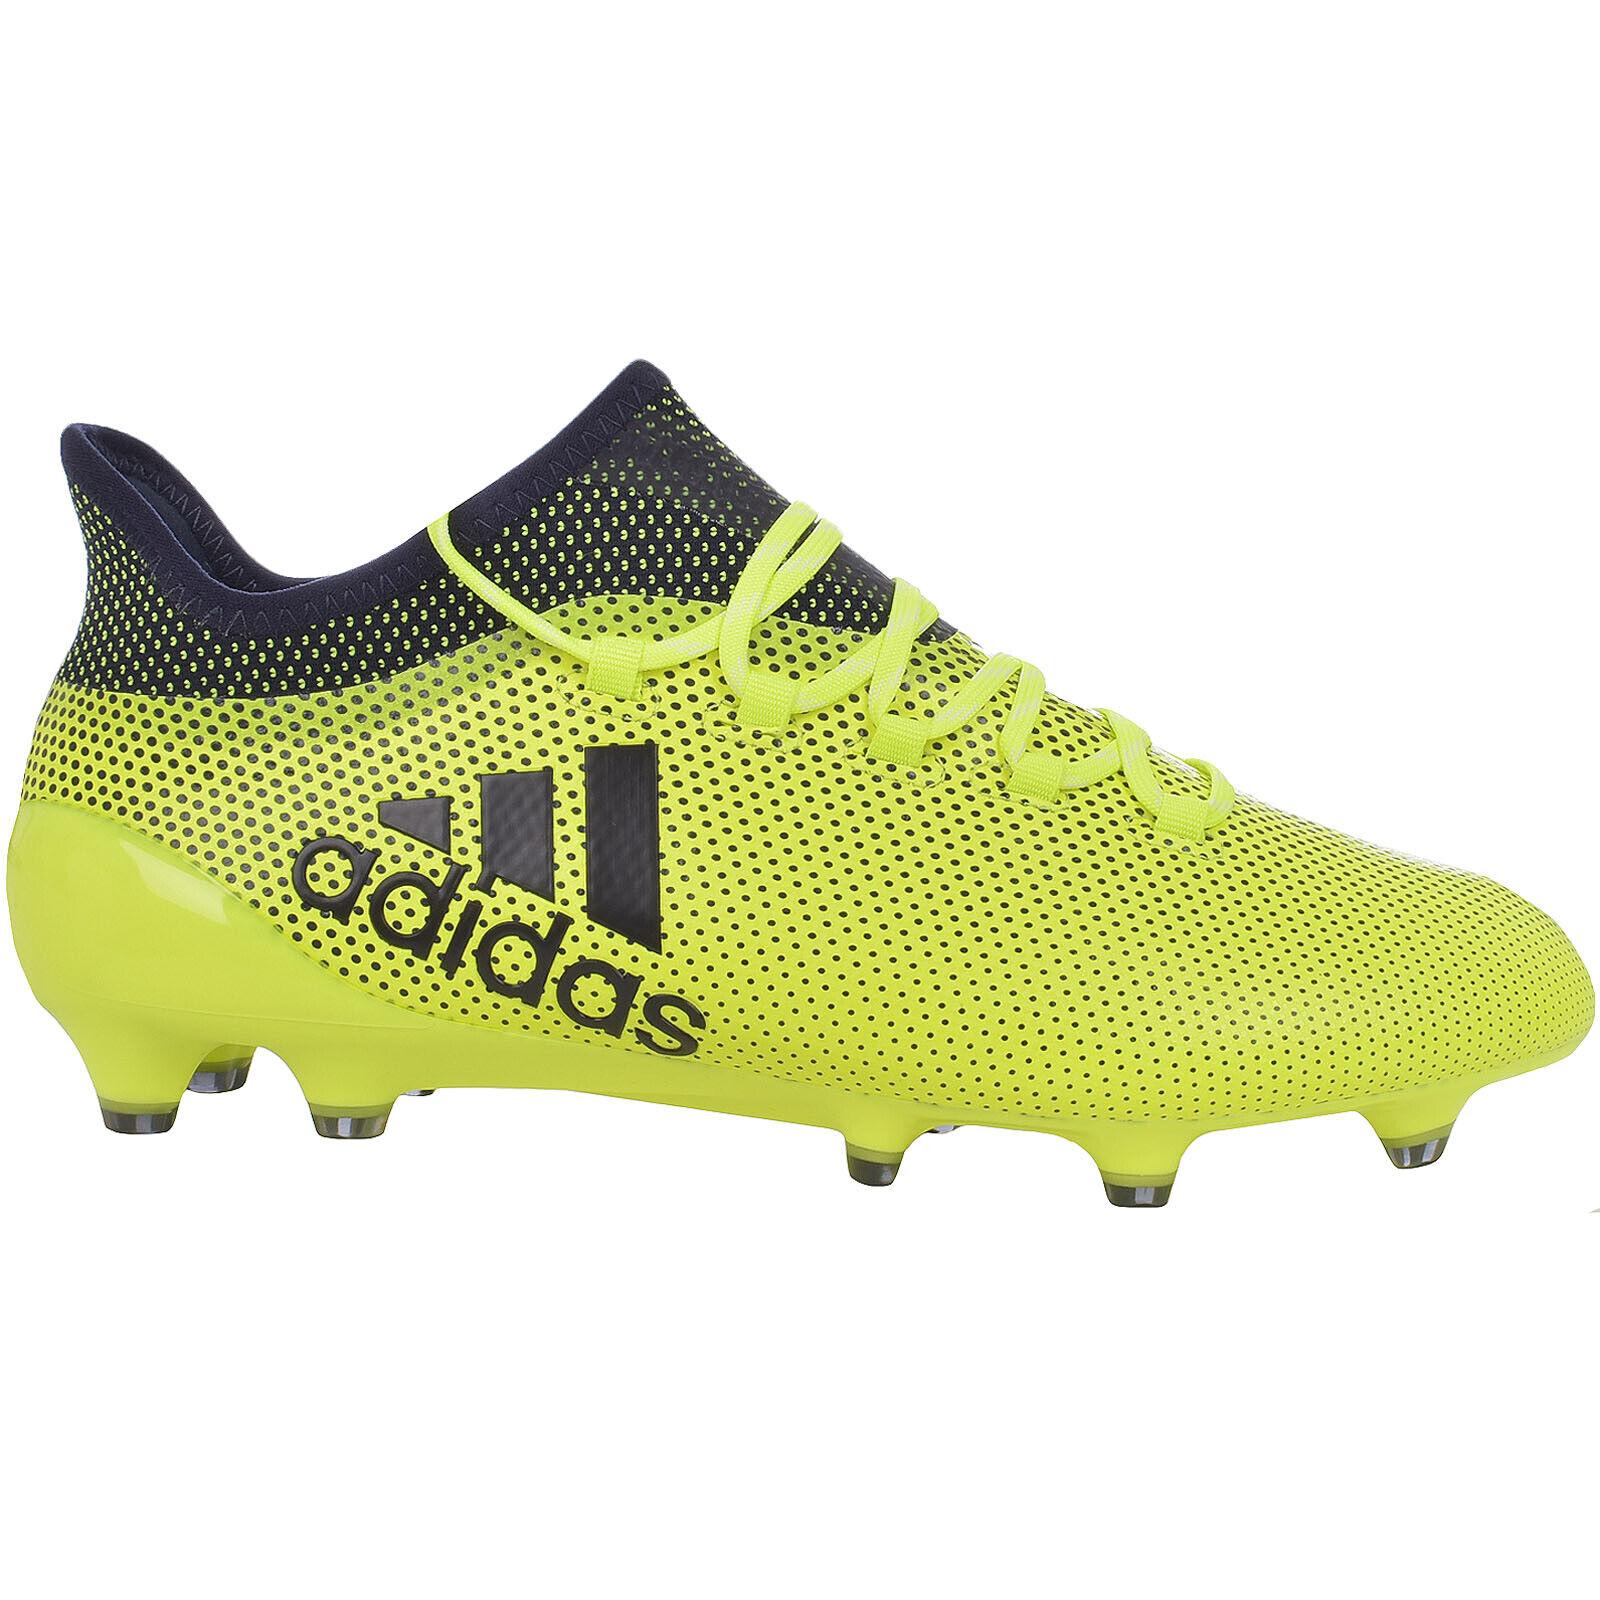 b7720626770 Adidas Performance Mens X 17.1 FG Football Sports botas zapatos - amarillo